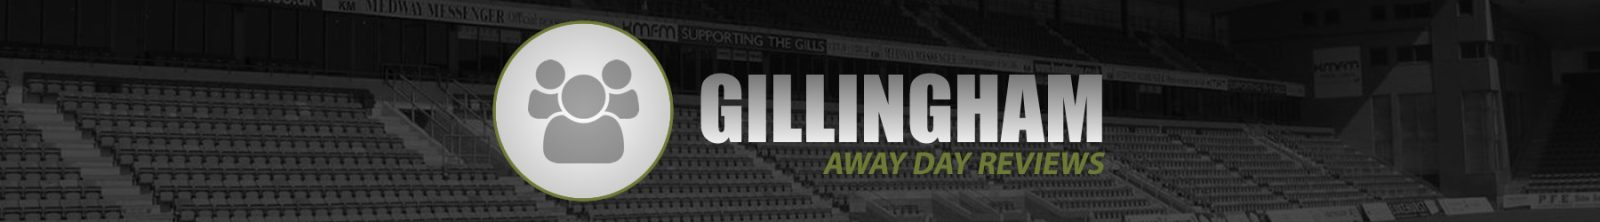 Review Gillingham